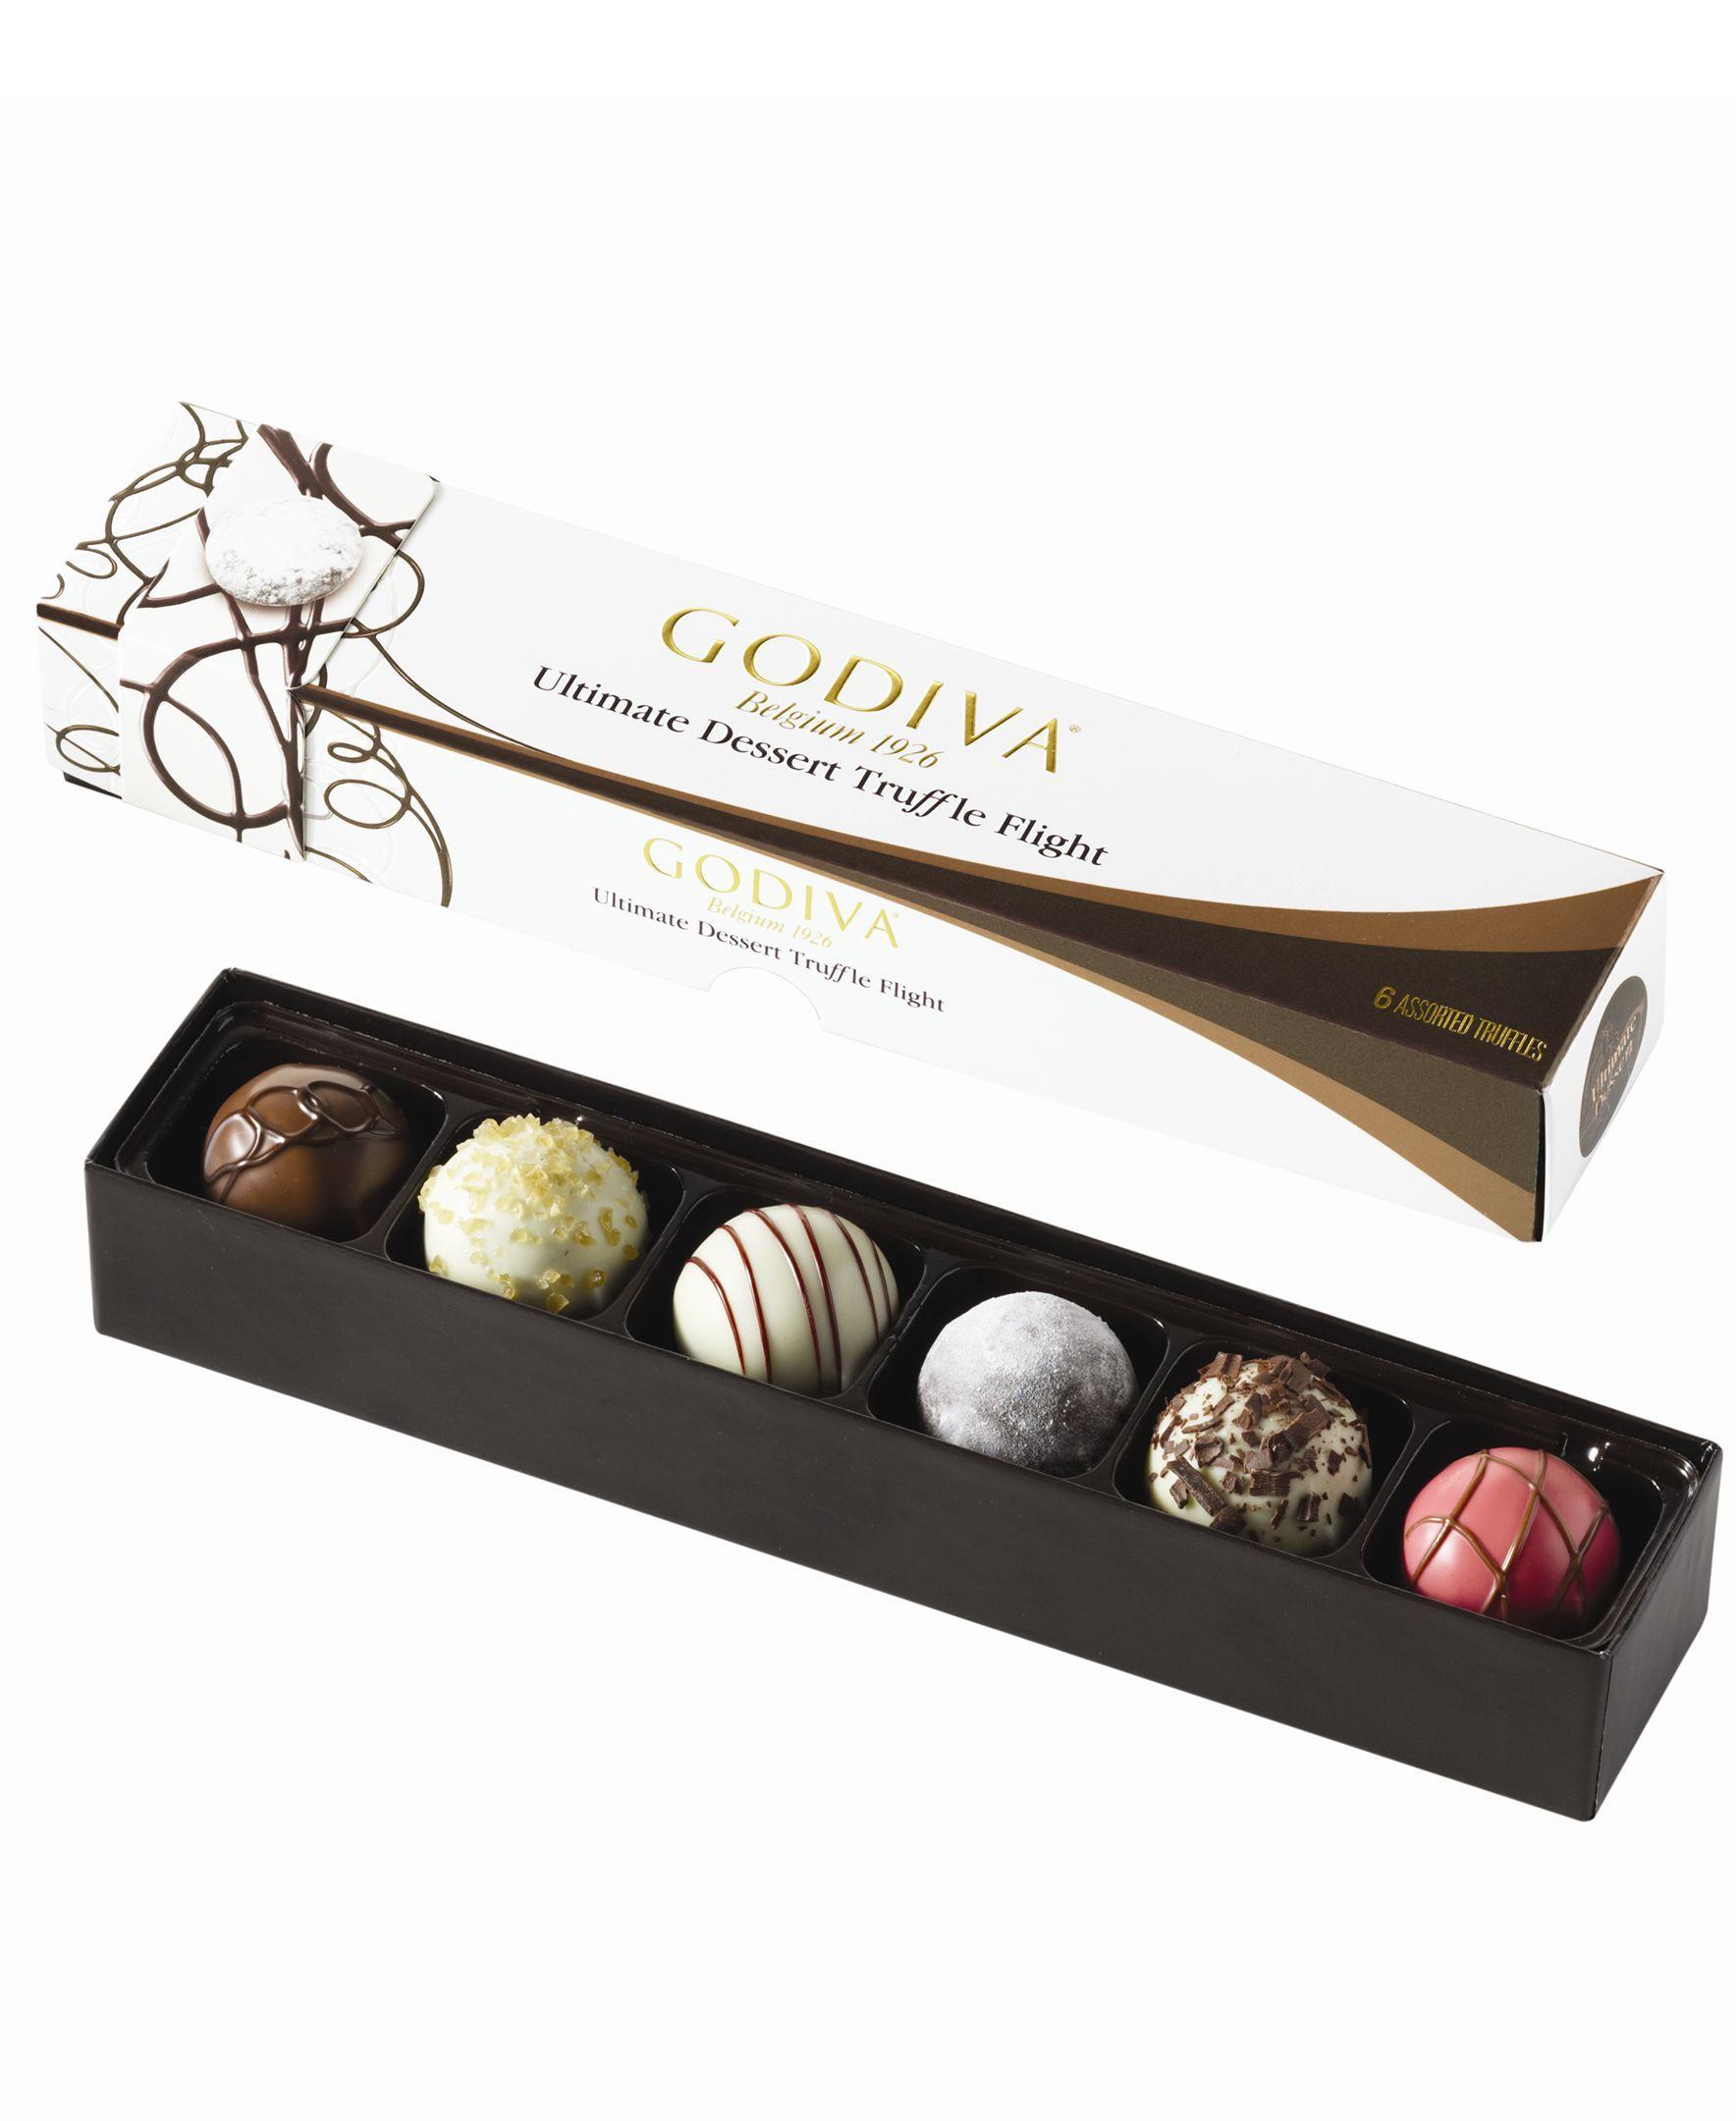 Godiva Chocolatier, 6-Piece Ultimate Dessert Truffle Flight